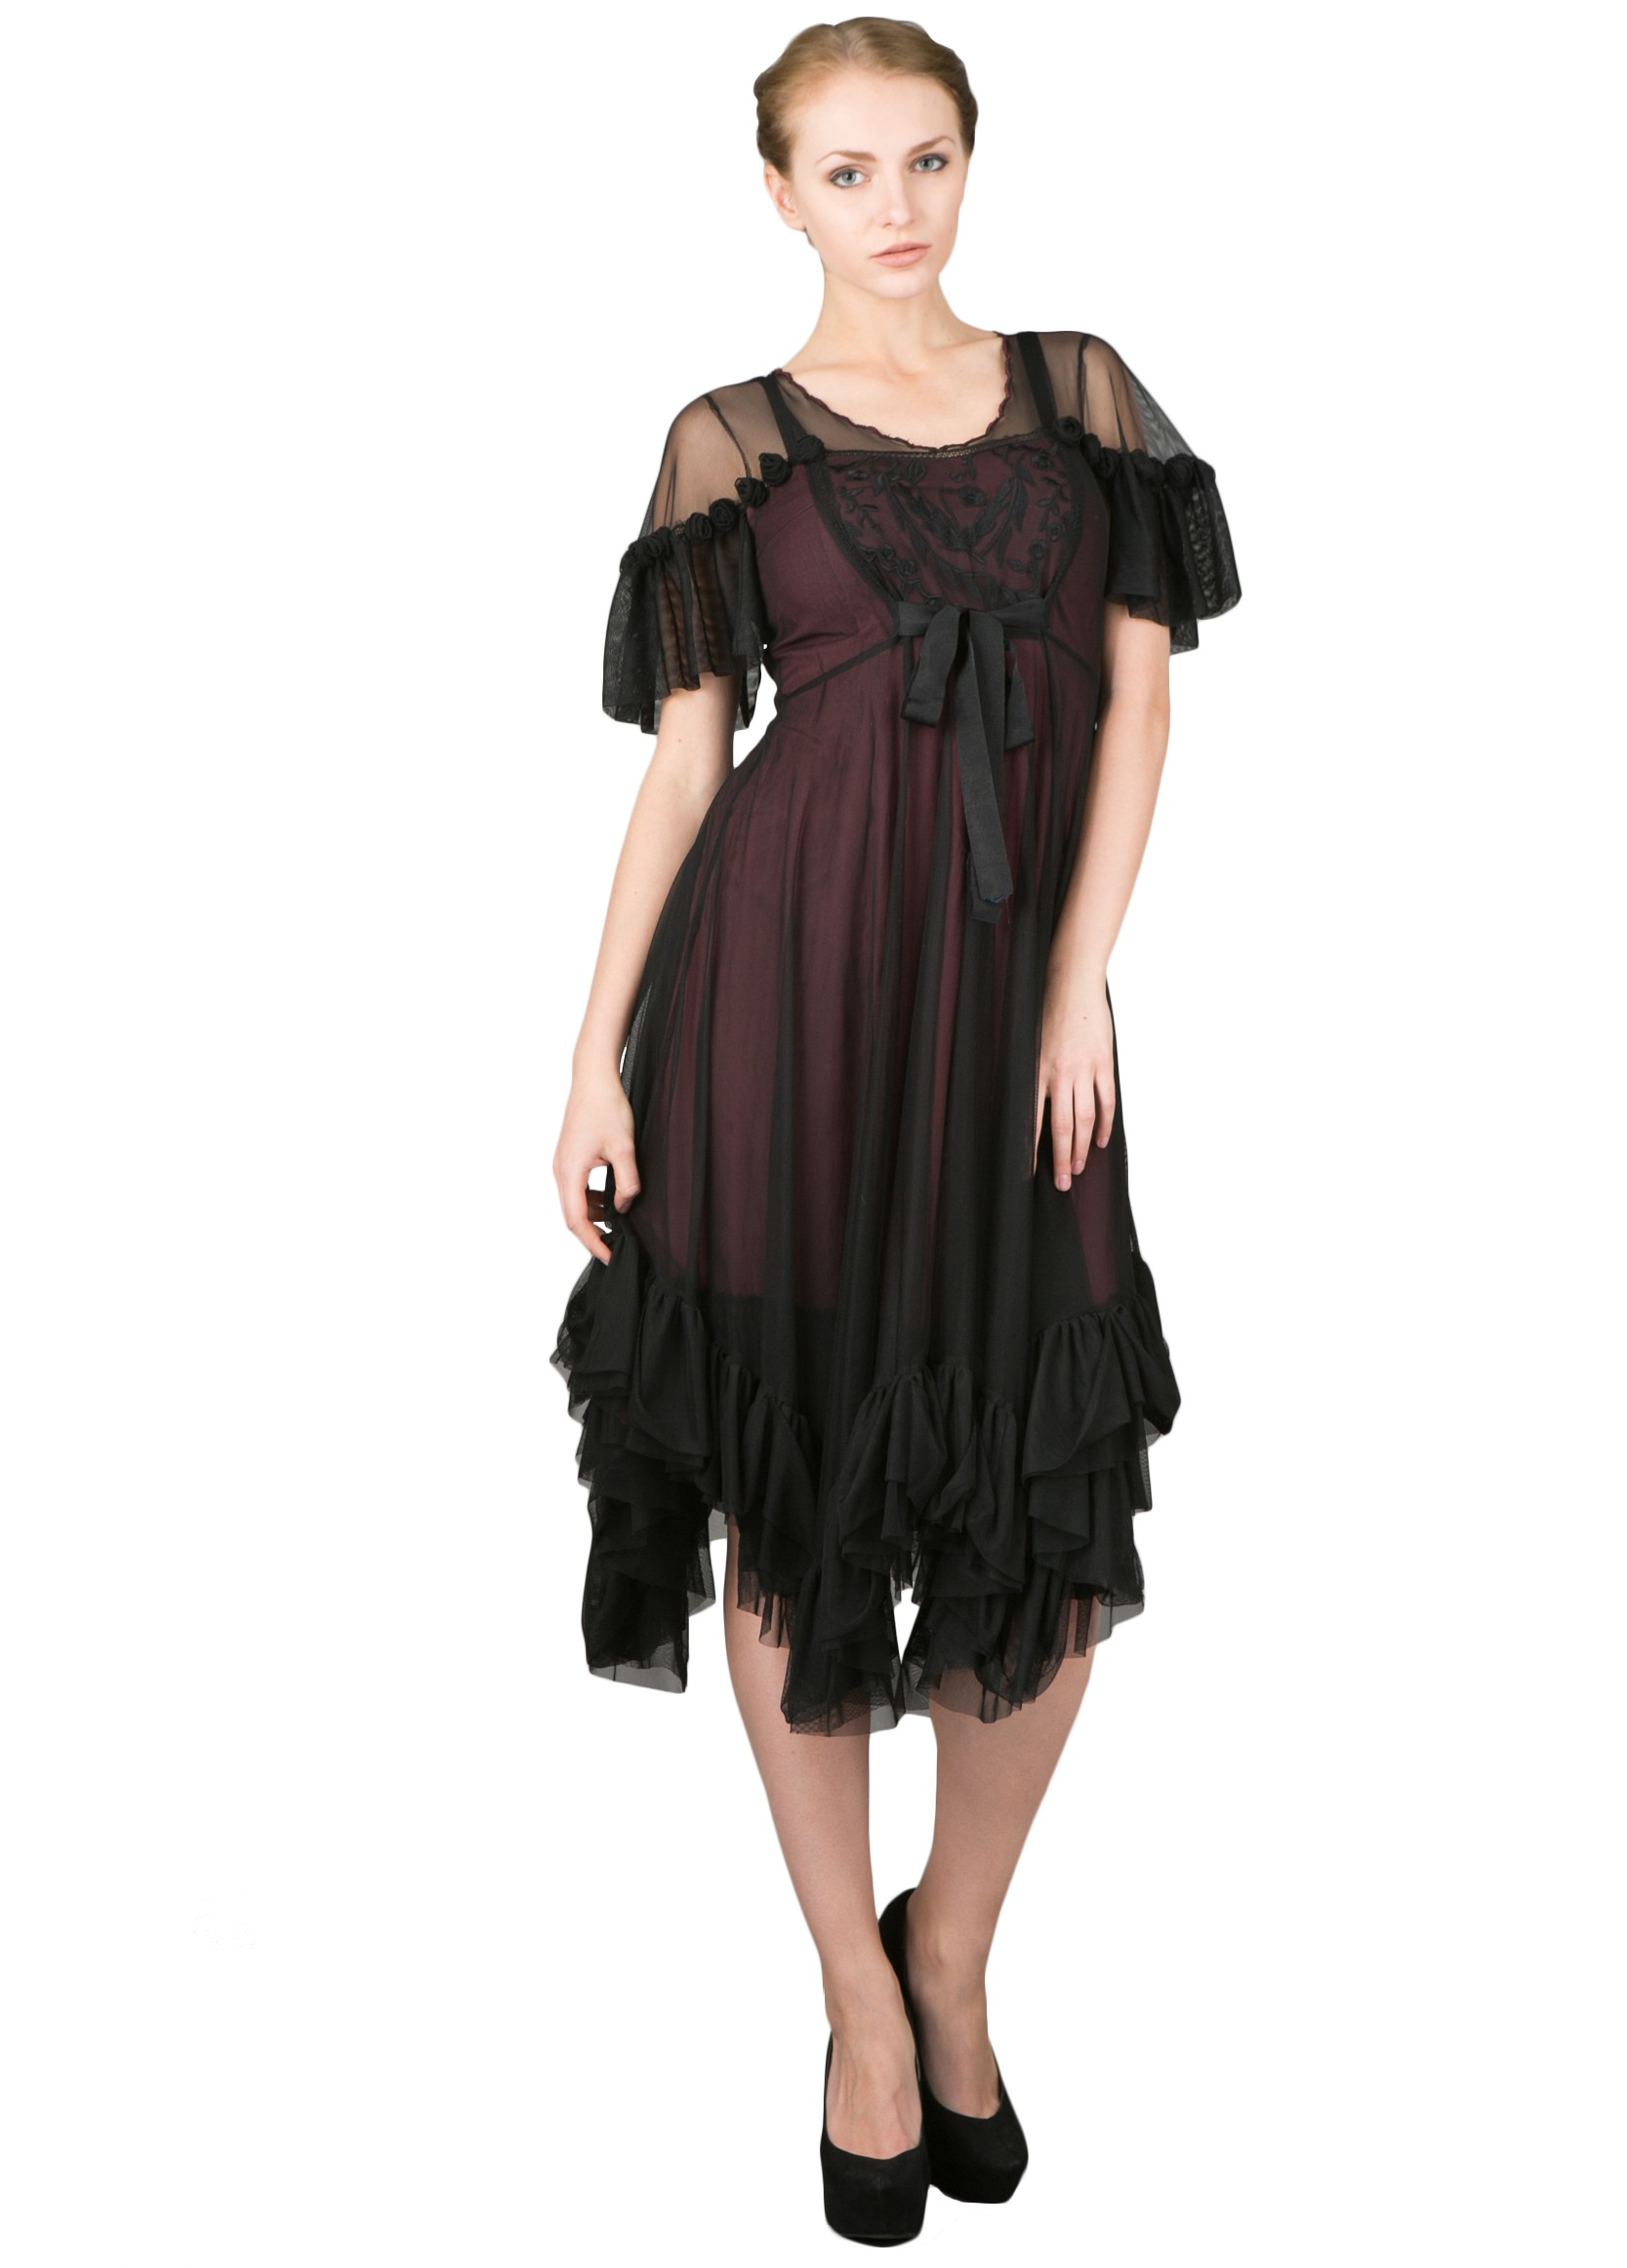 Romantic Black Andalusia Tea Party Dress by Nataya